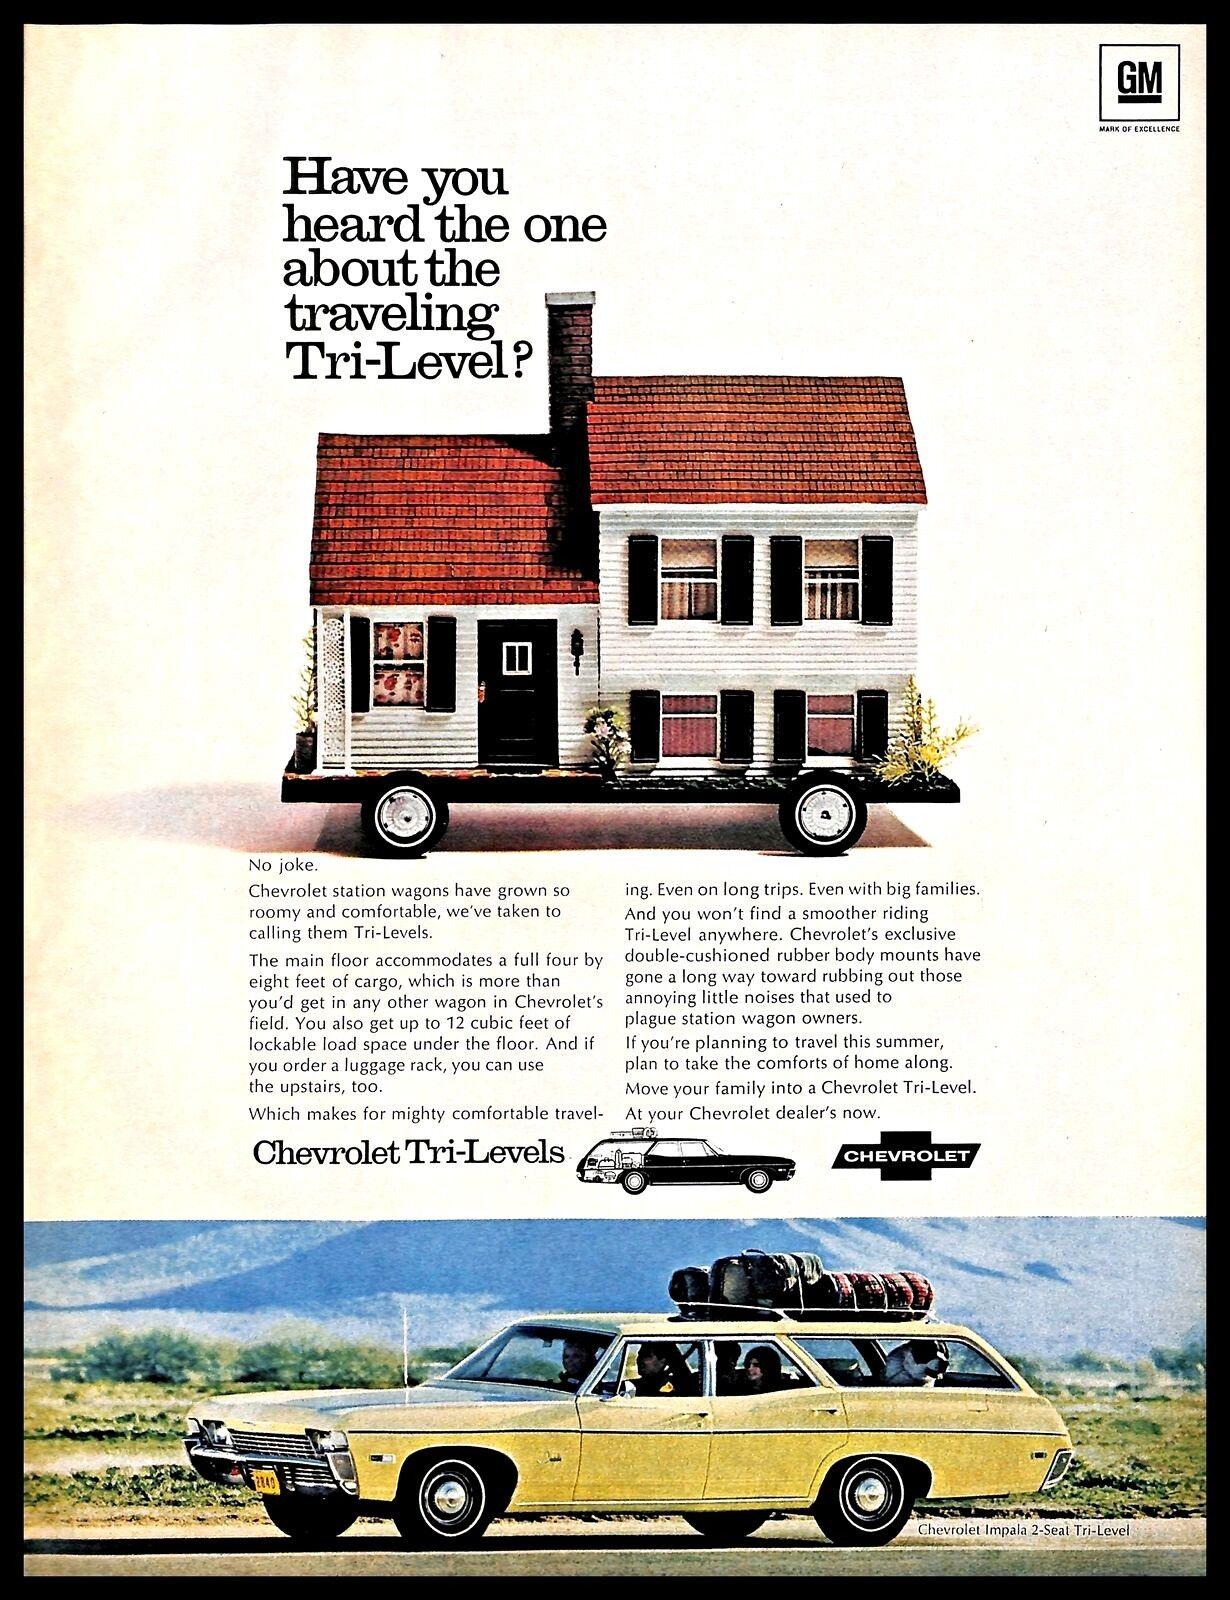 1968 Chevrolet Tri Level Car Vintage Print Ad Station Wagon Family Travel 1960s Ebay